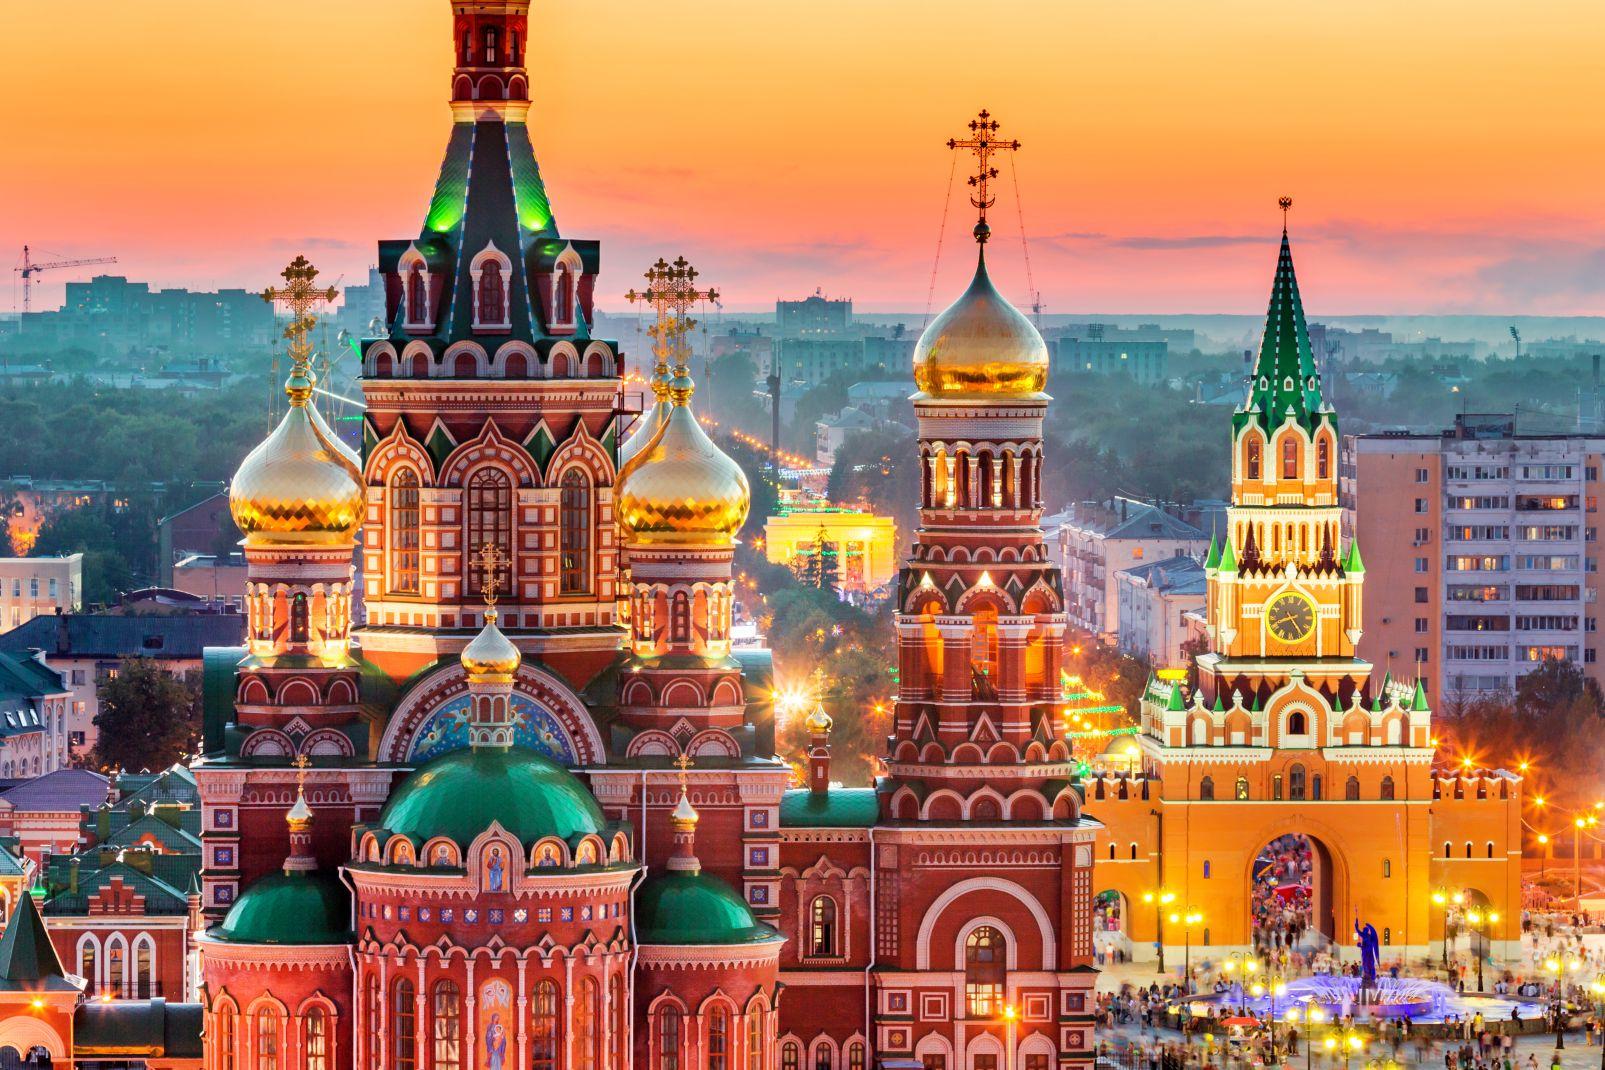 fédération, russie, europe, moscou, place rouge, kremlin